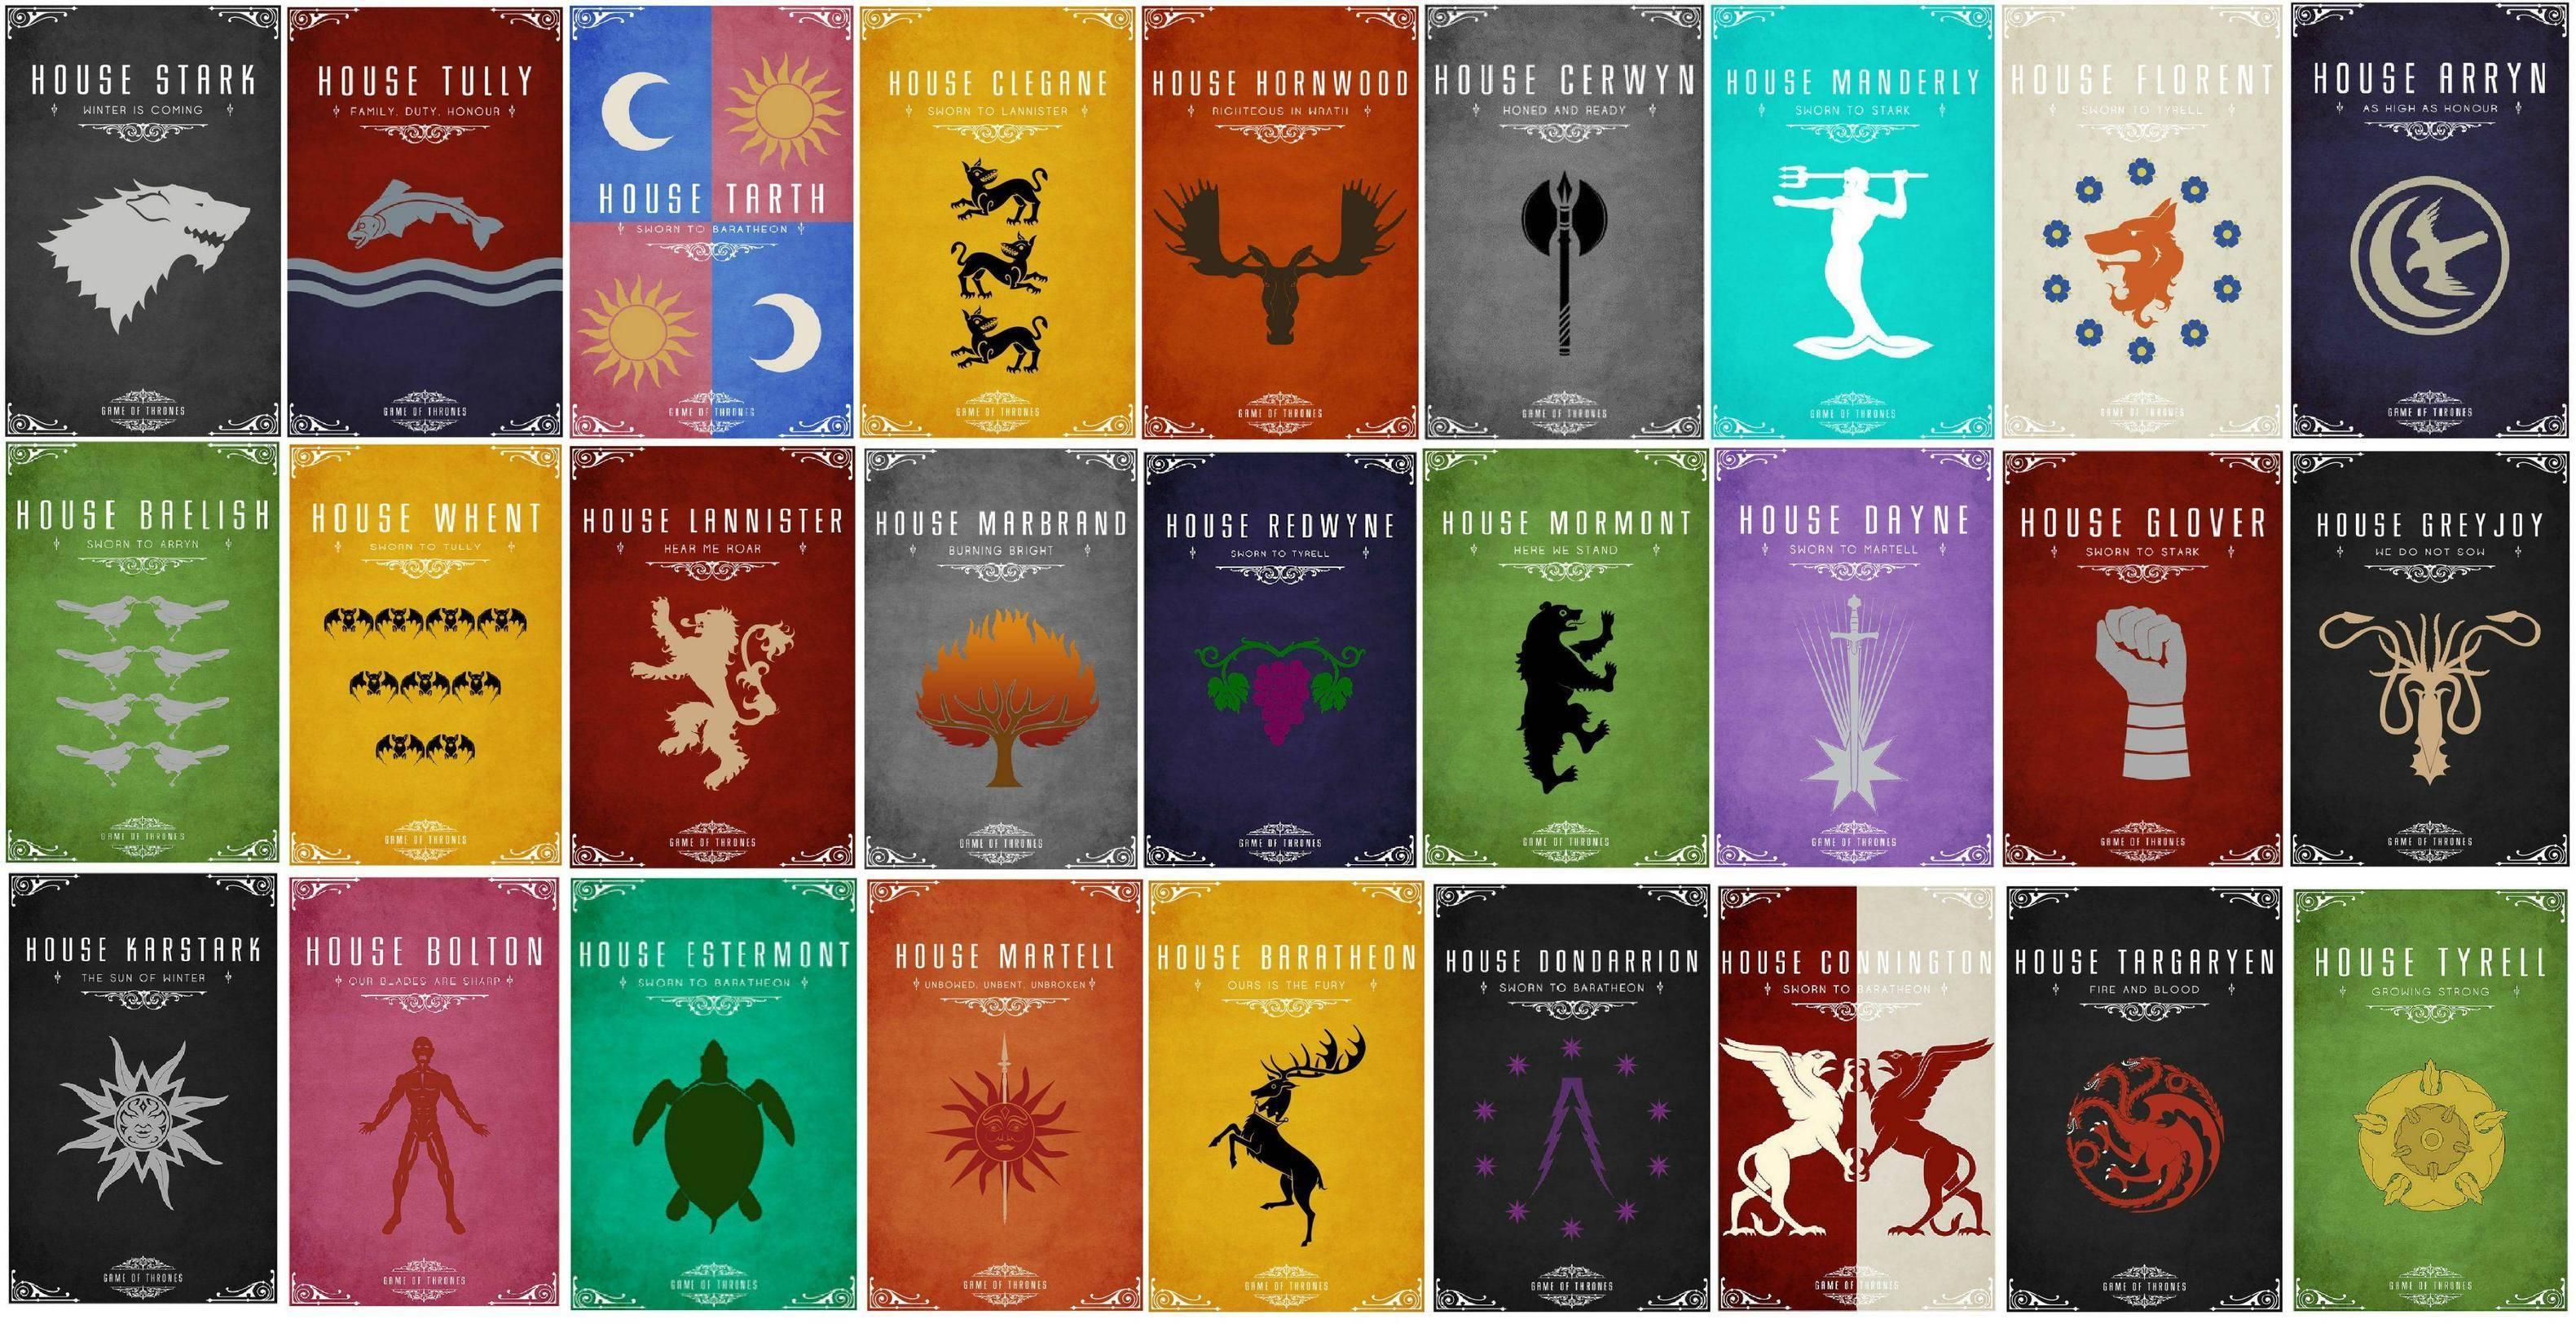 Game Of Thrones House Wallpapers Wallpapersafari